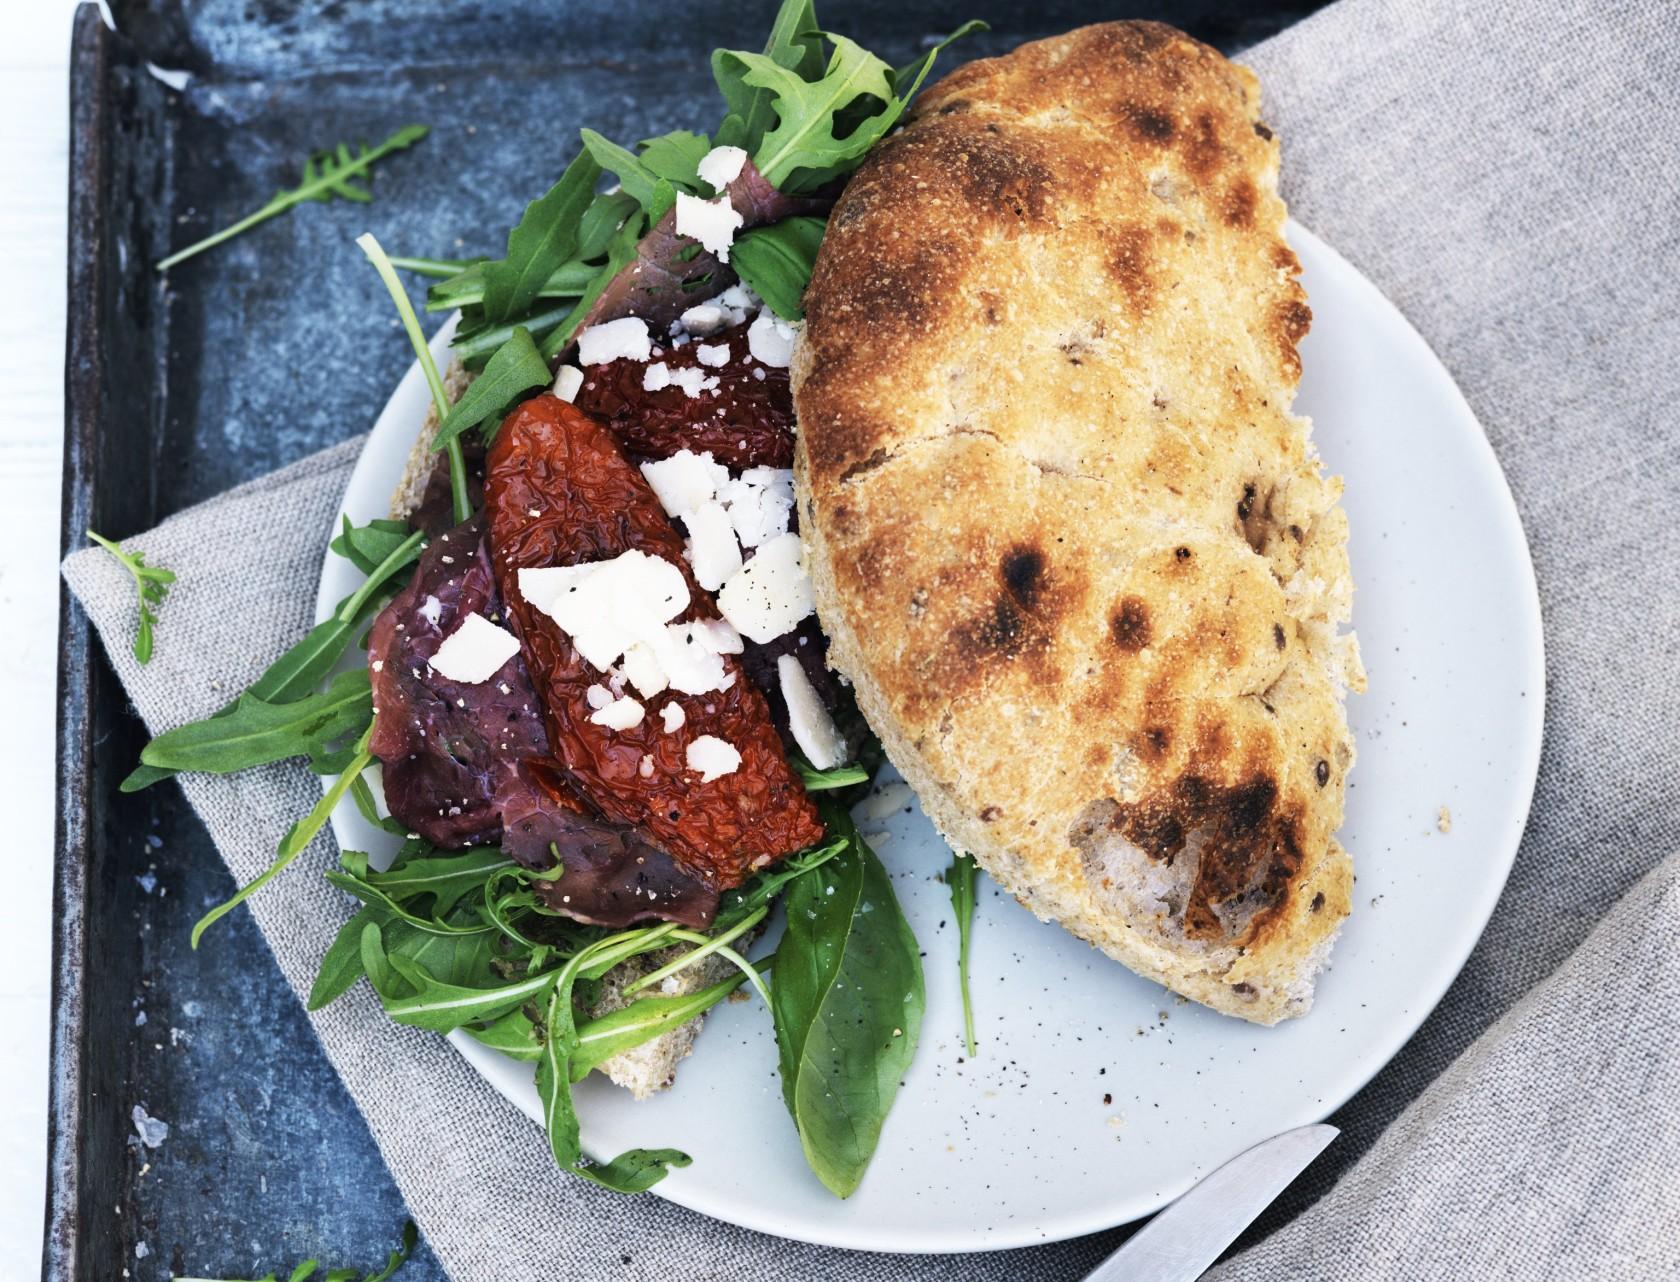 Lækker italiensk sandwich med carpaccio og basilikumpesto